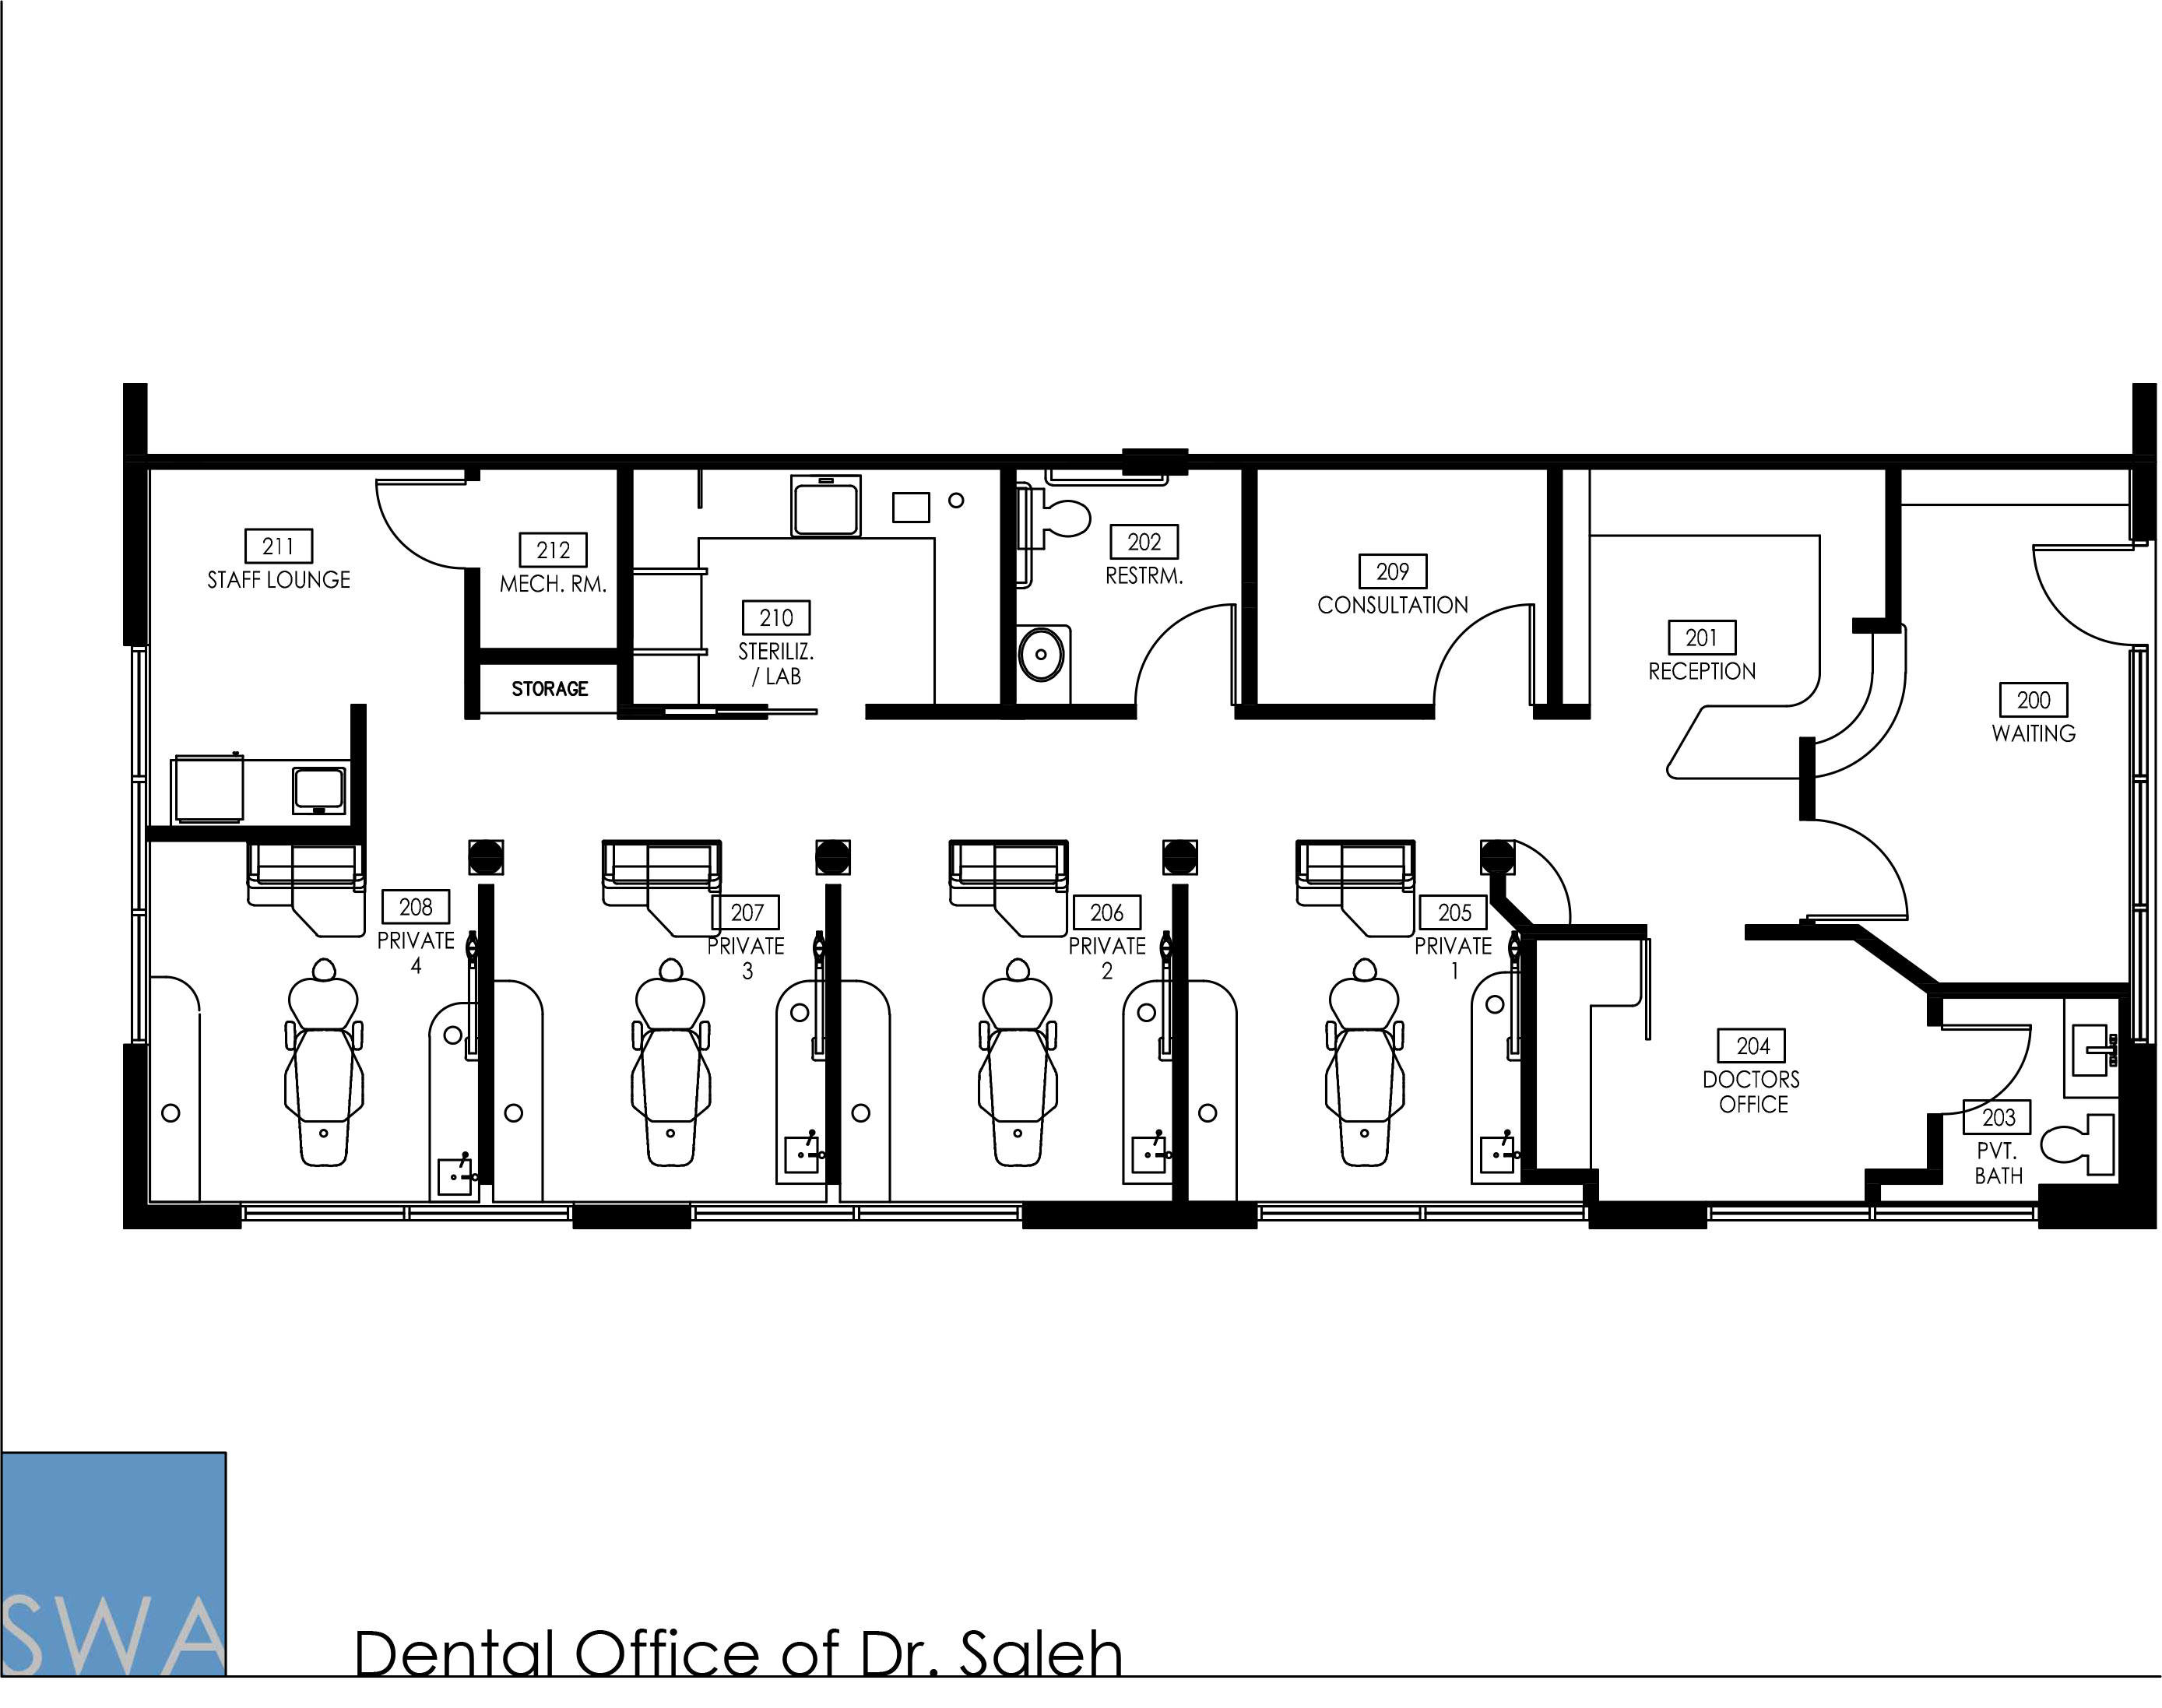 The Dental Office Of Dr. Saleh